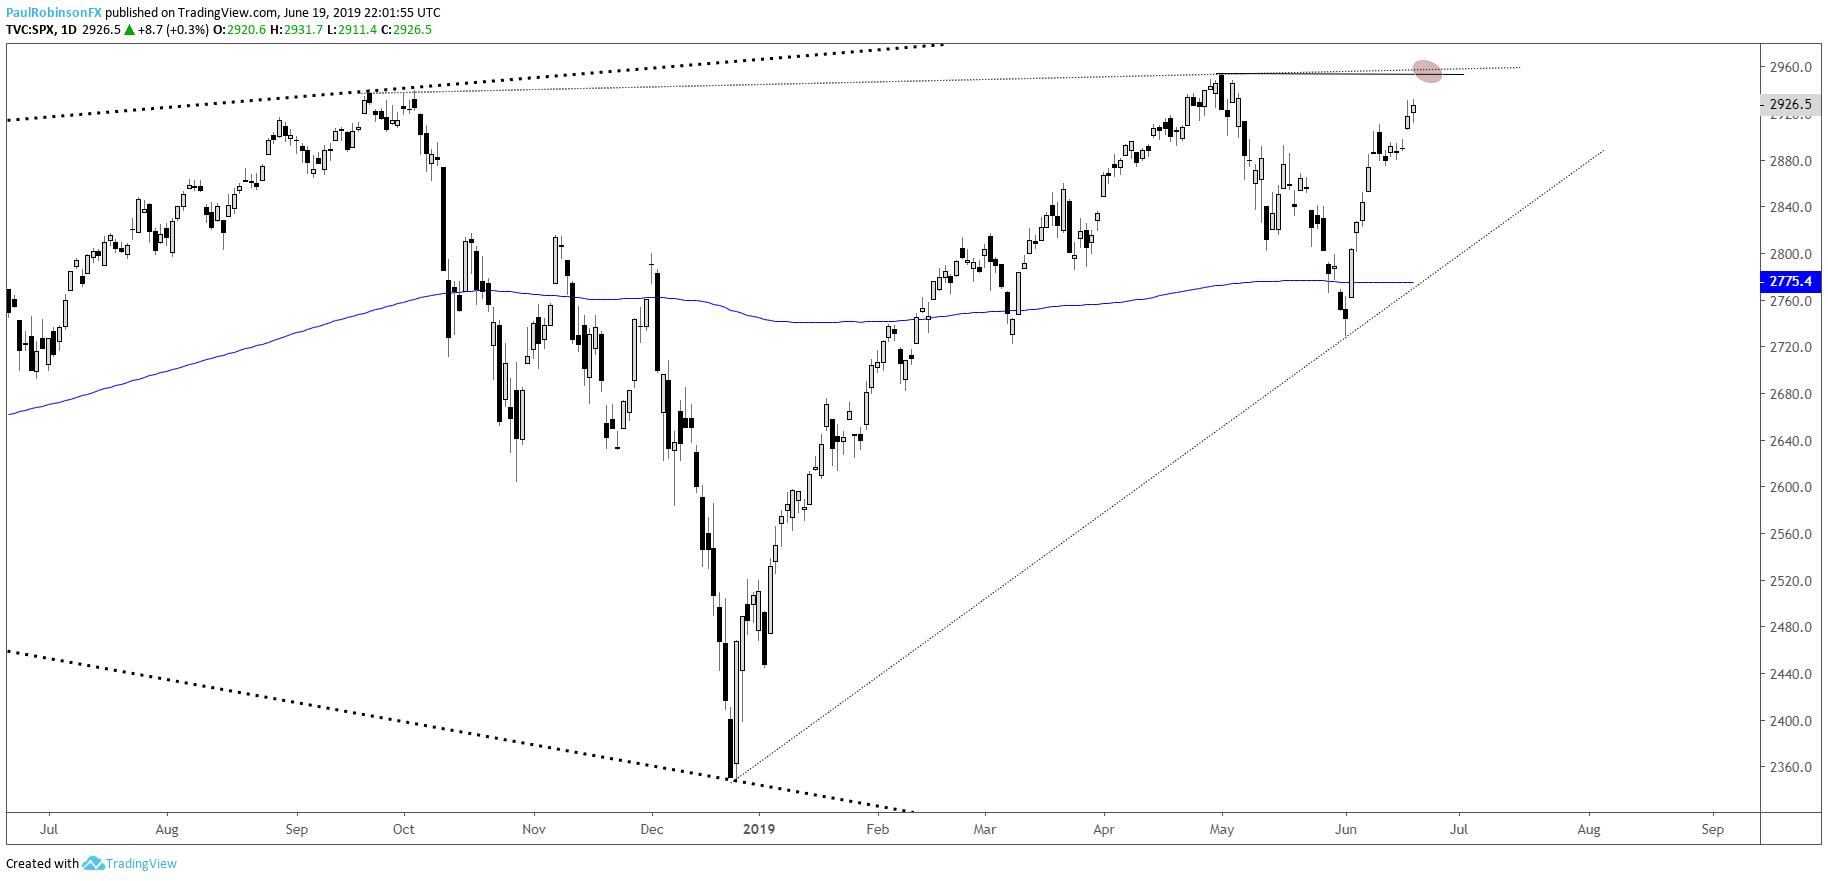 Dow Jones, S&P 500, and Nasdaq 100 Technical Outlook as